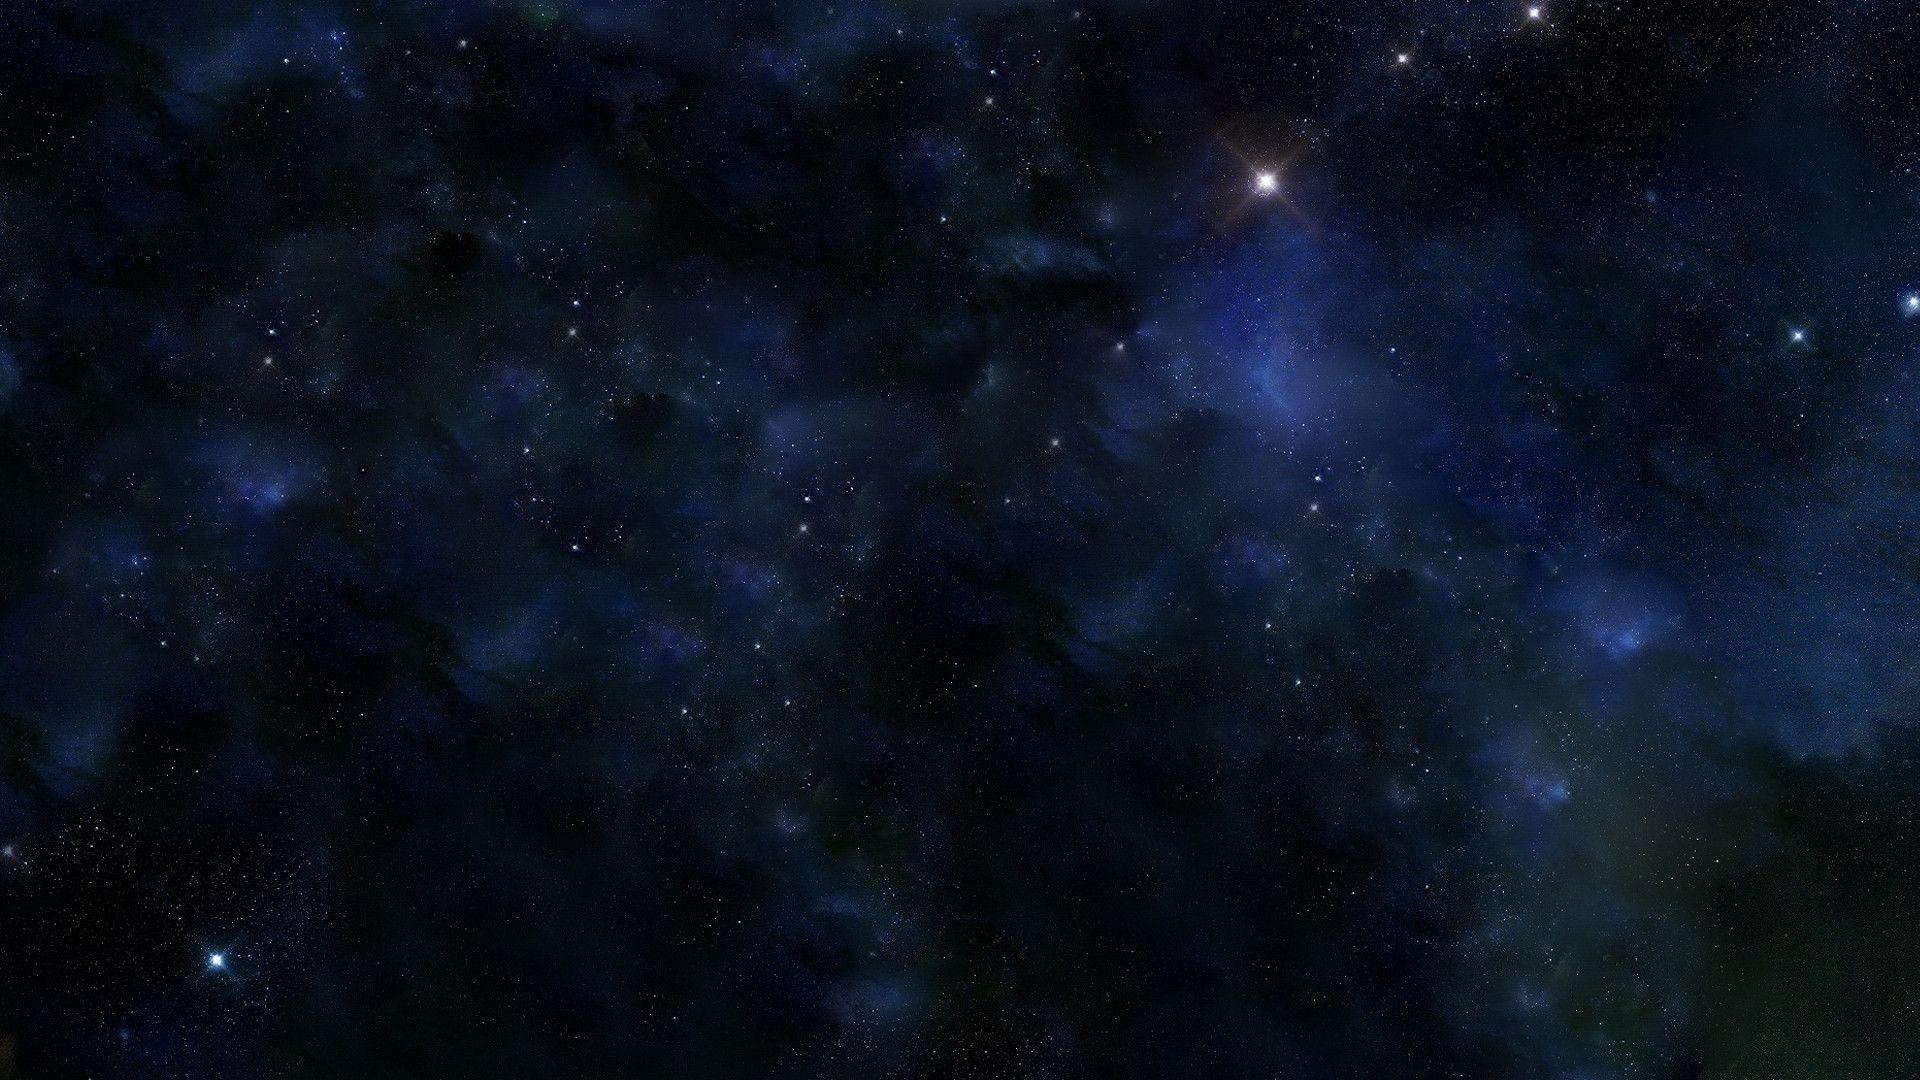 Dark Space Background 64 Pictures